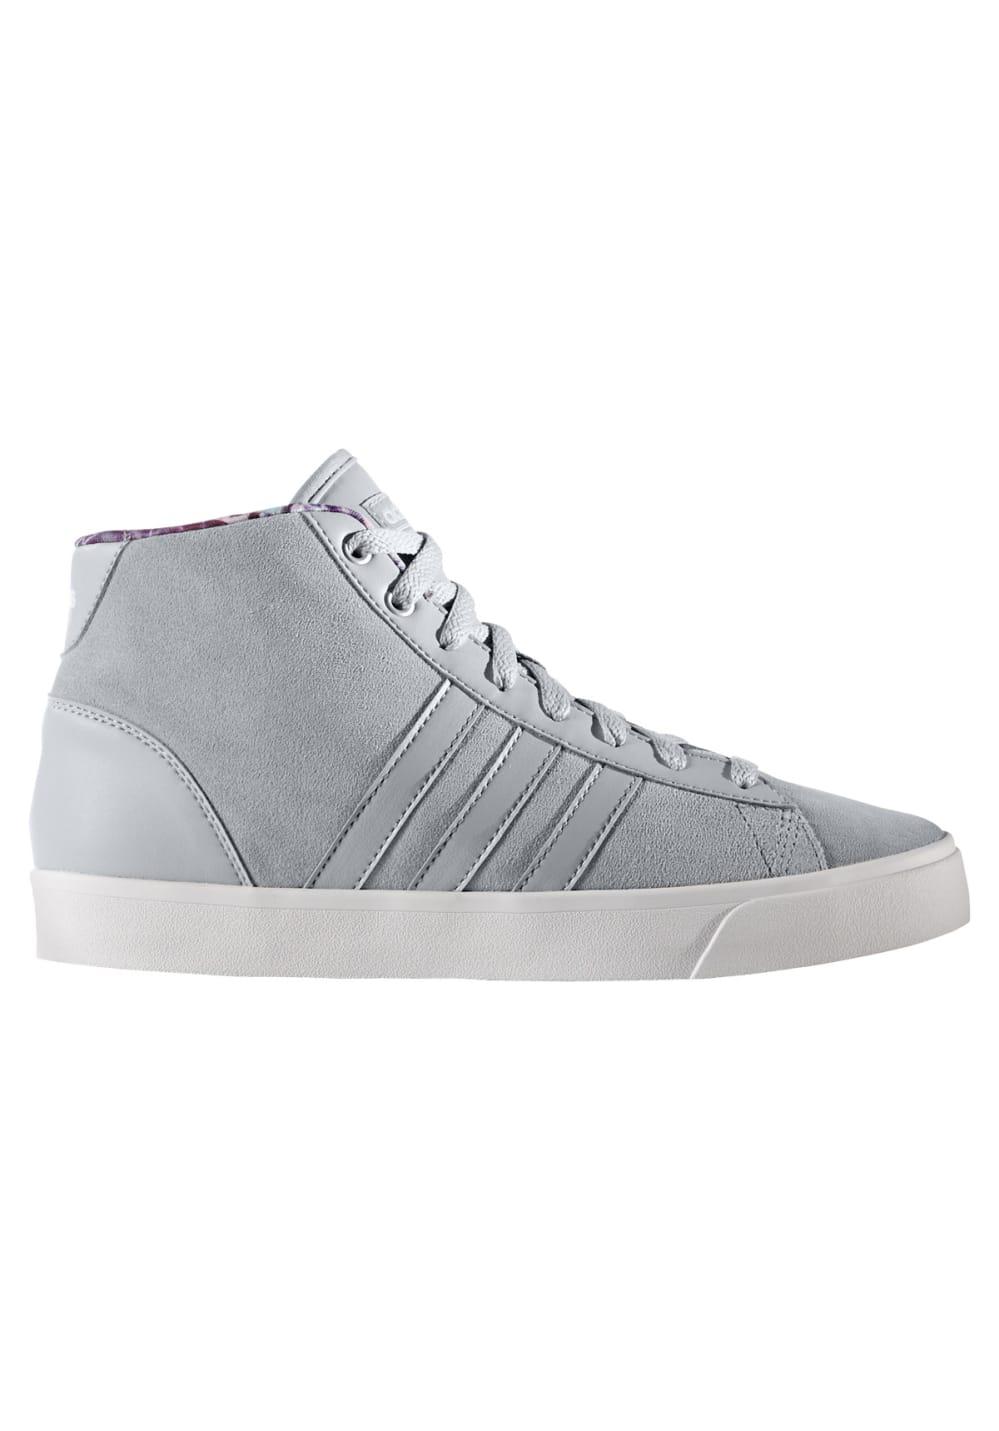 huge selection of cf7fa 43522 ... adidas neo Cloudfoam Daily QT Mid - Sneaker für Damen - Grau. Zurück  zur Übersicht. -60%